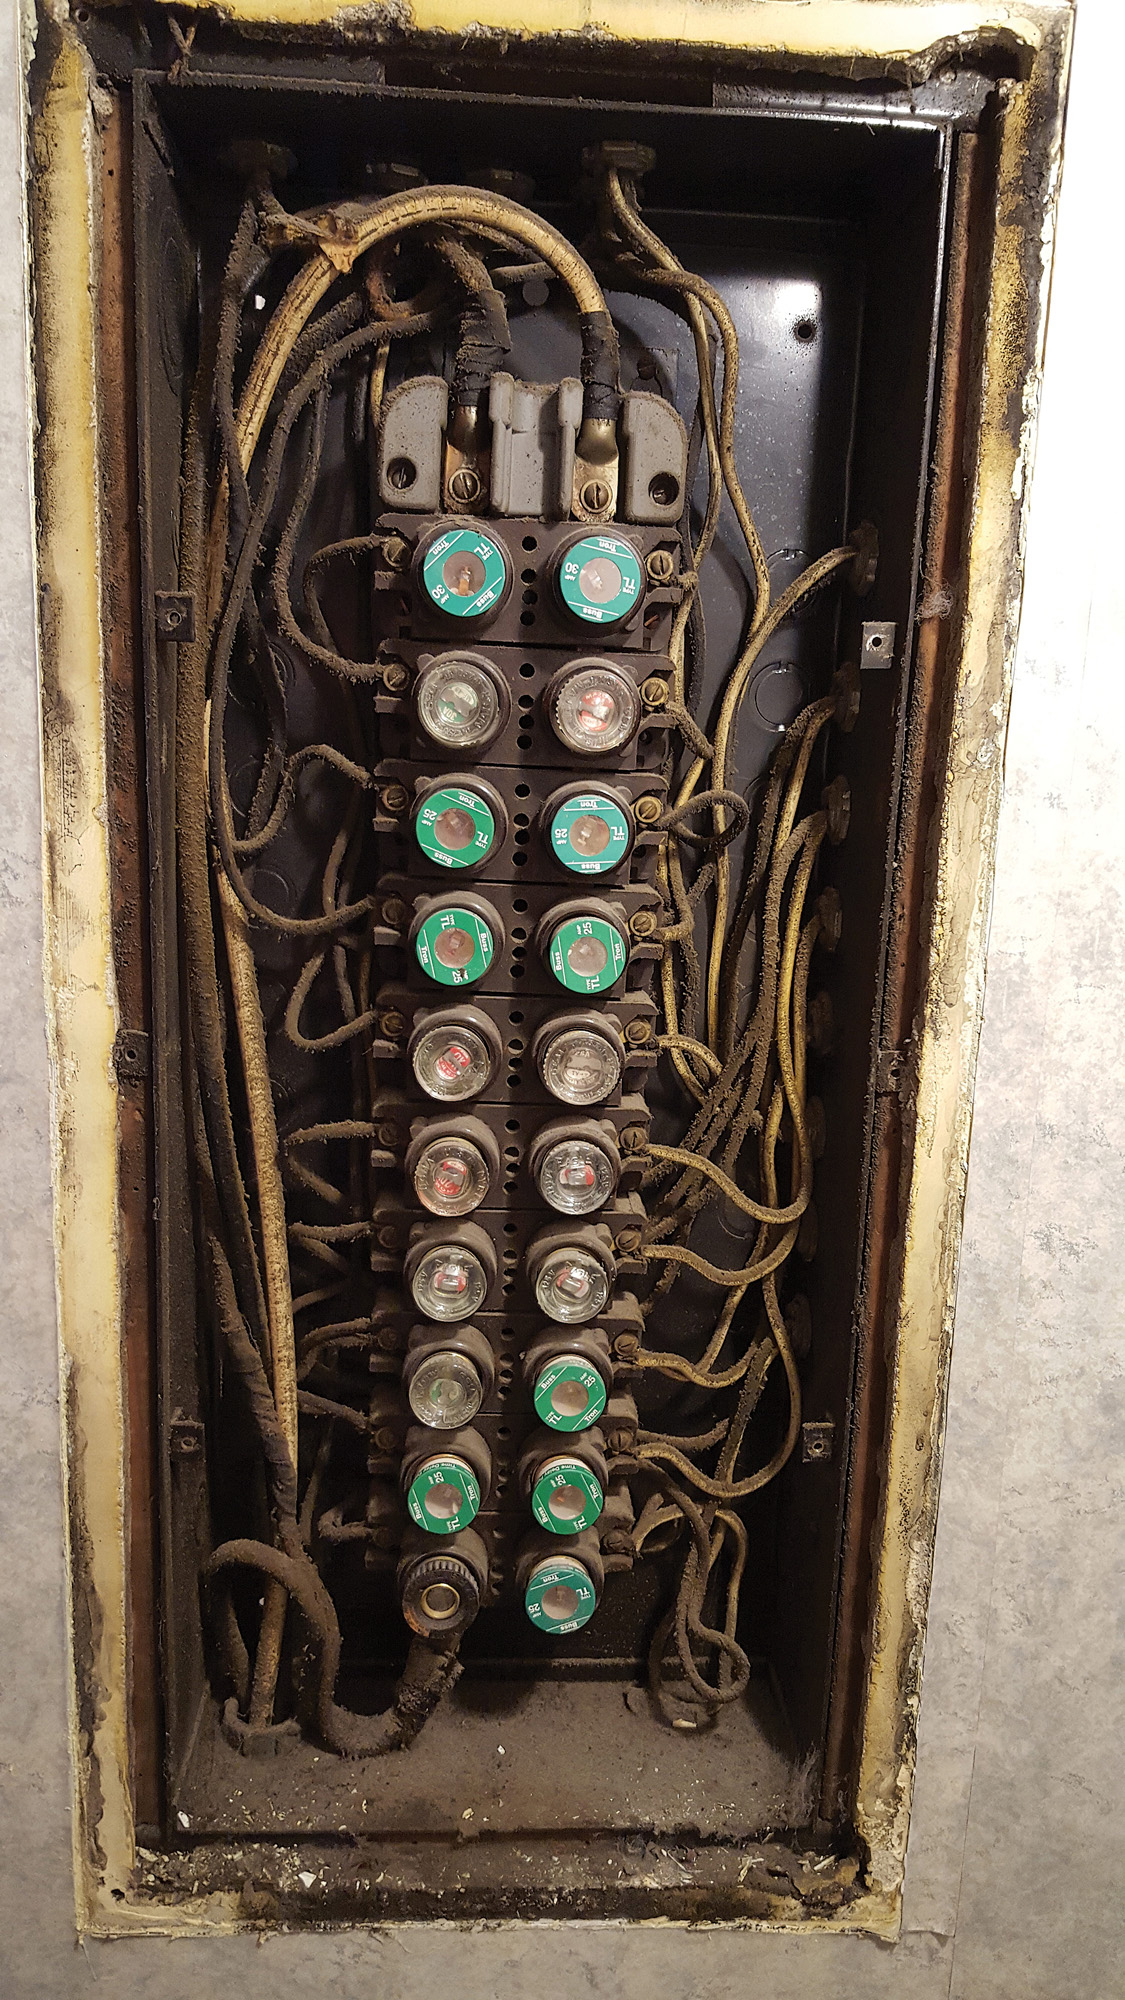 home fuse box wiring diagram time clock diagrams clicks 1950 electrical